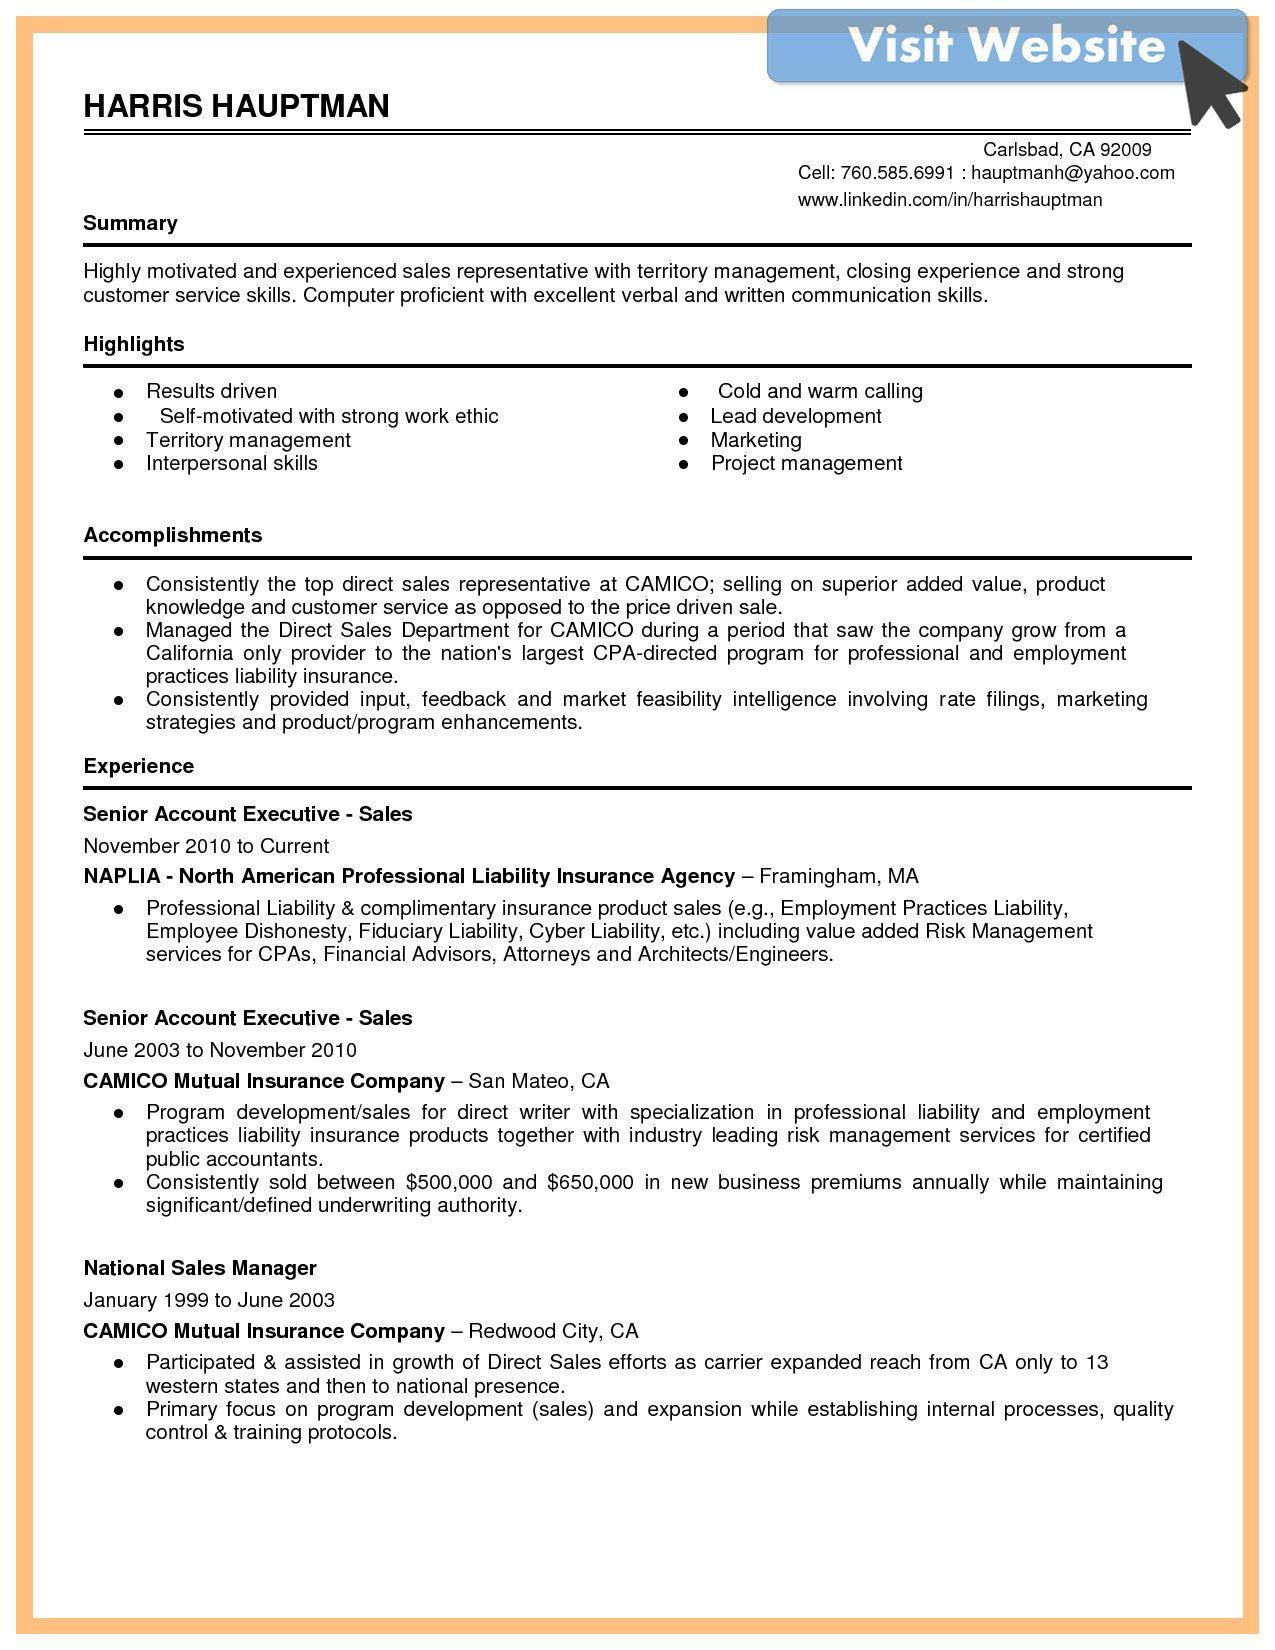 Customer Service Resume Summary Examples 2019 In 2020 Resume Examples Customer Service Resume Examples Resume Skills